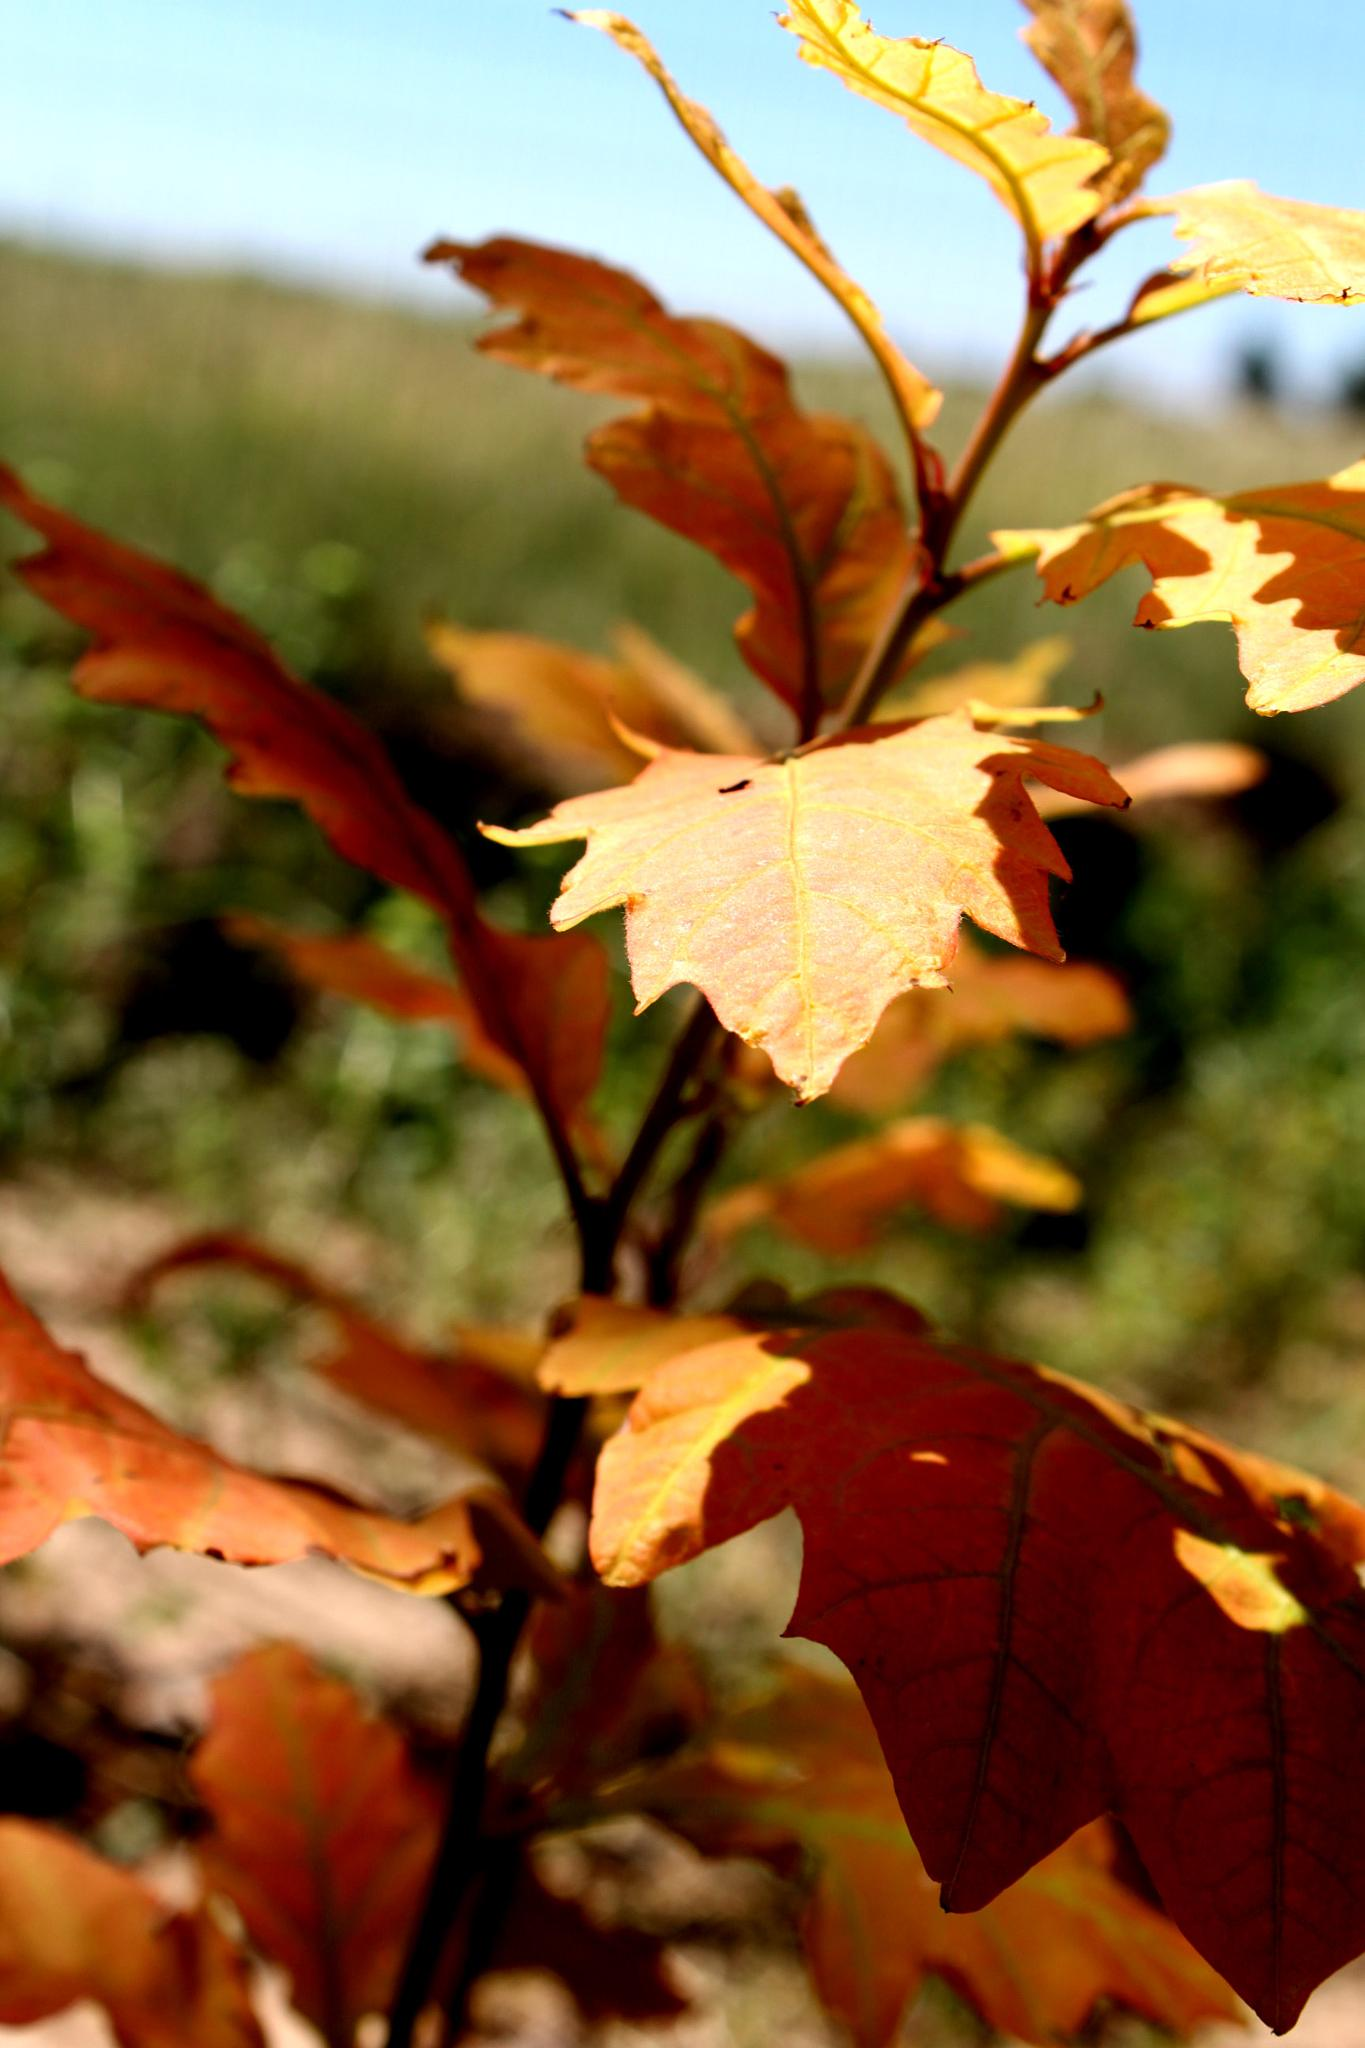 Shades of Autumn by Lucretia Bittner